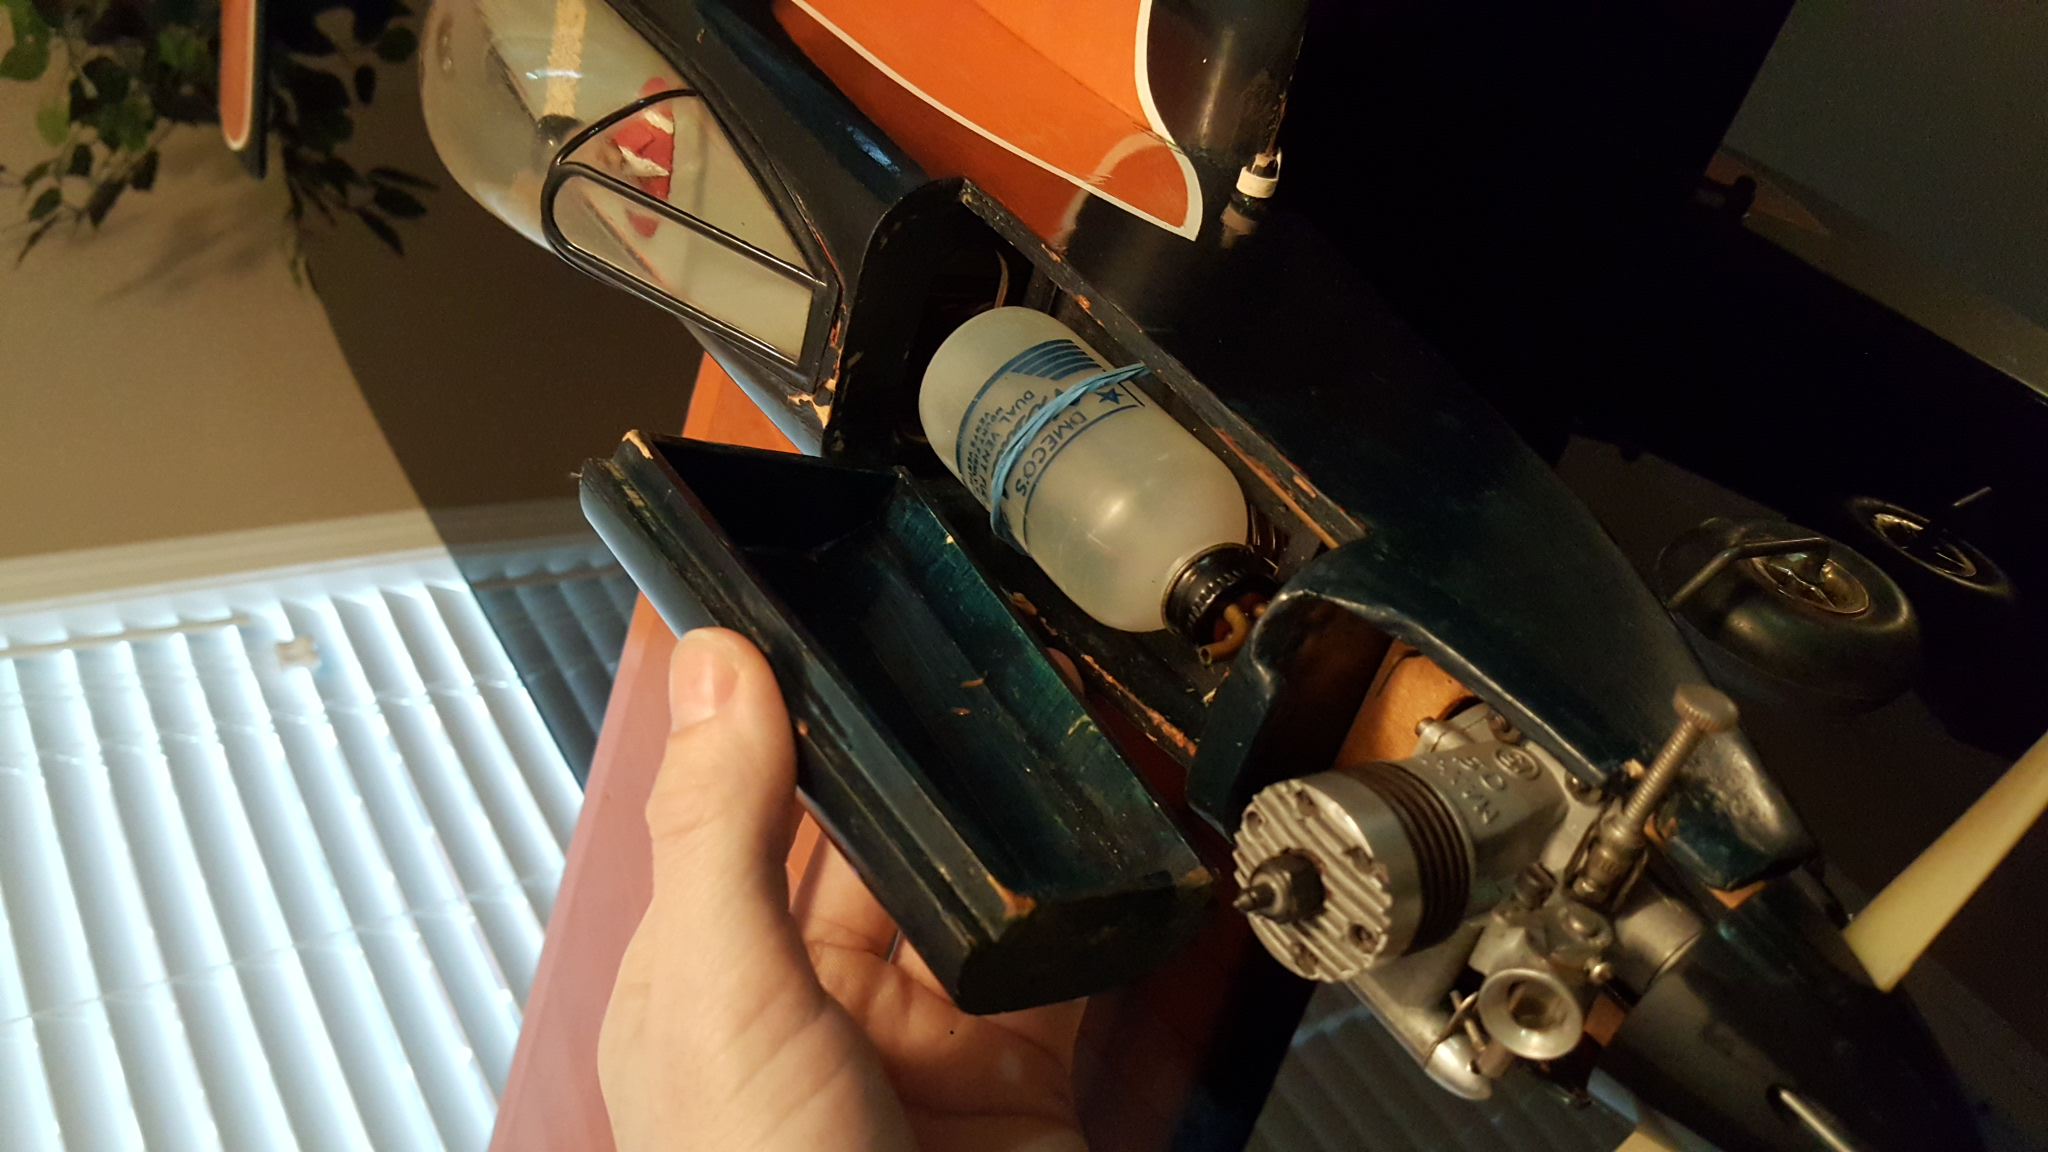 Click image for larger version  Name:Original Skylark fuel compartment.jpg Views:26 Size:559.9 KB ID:2197680